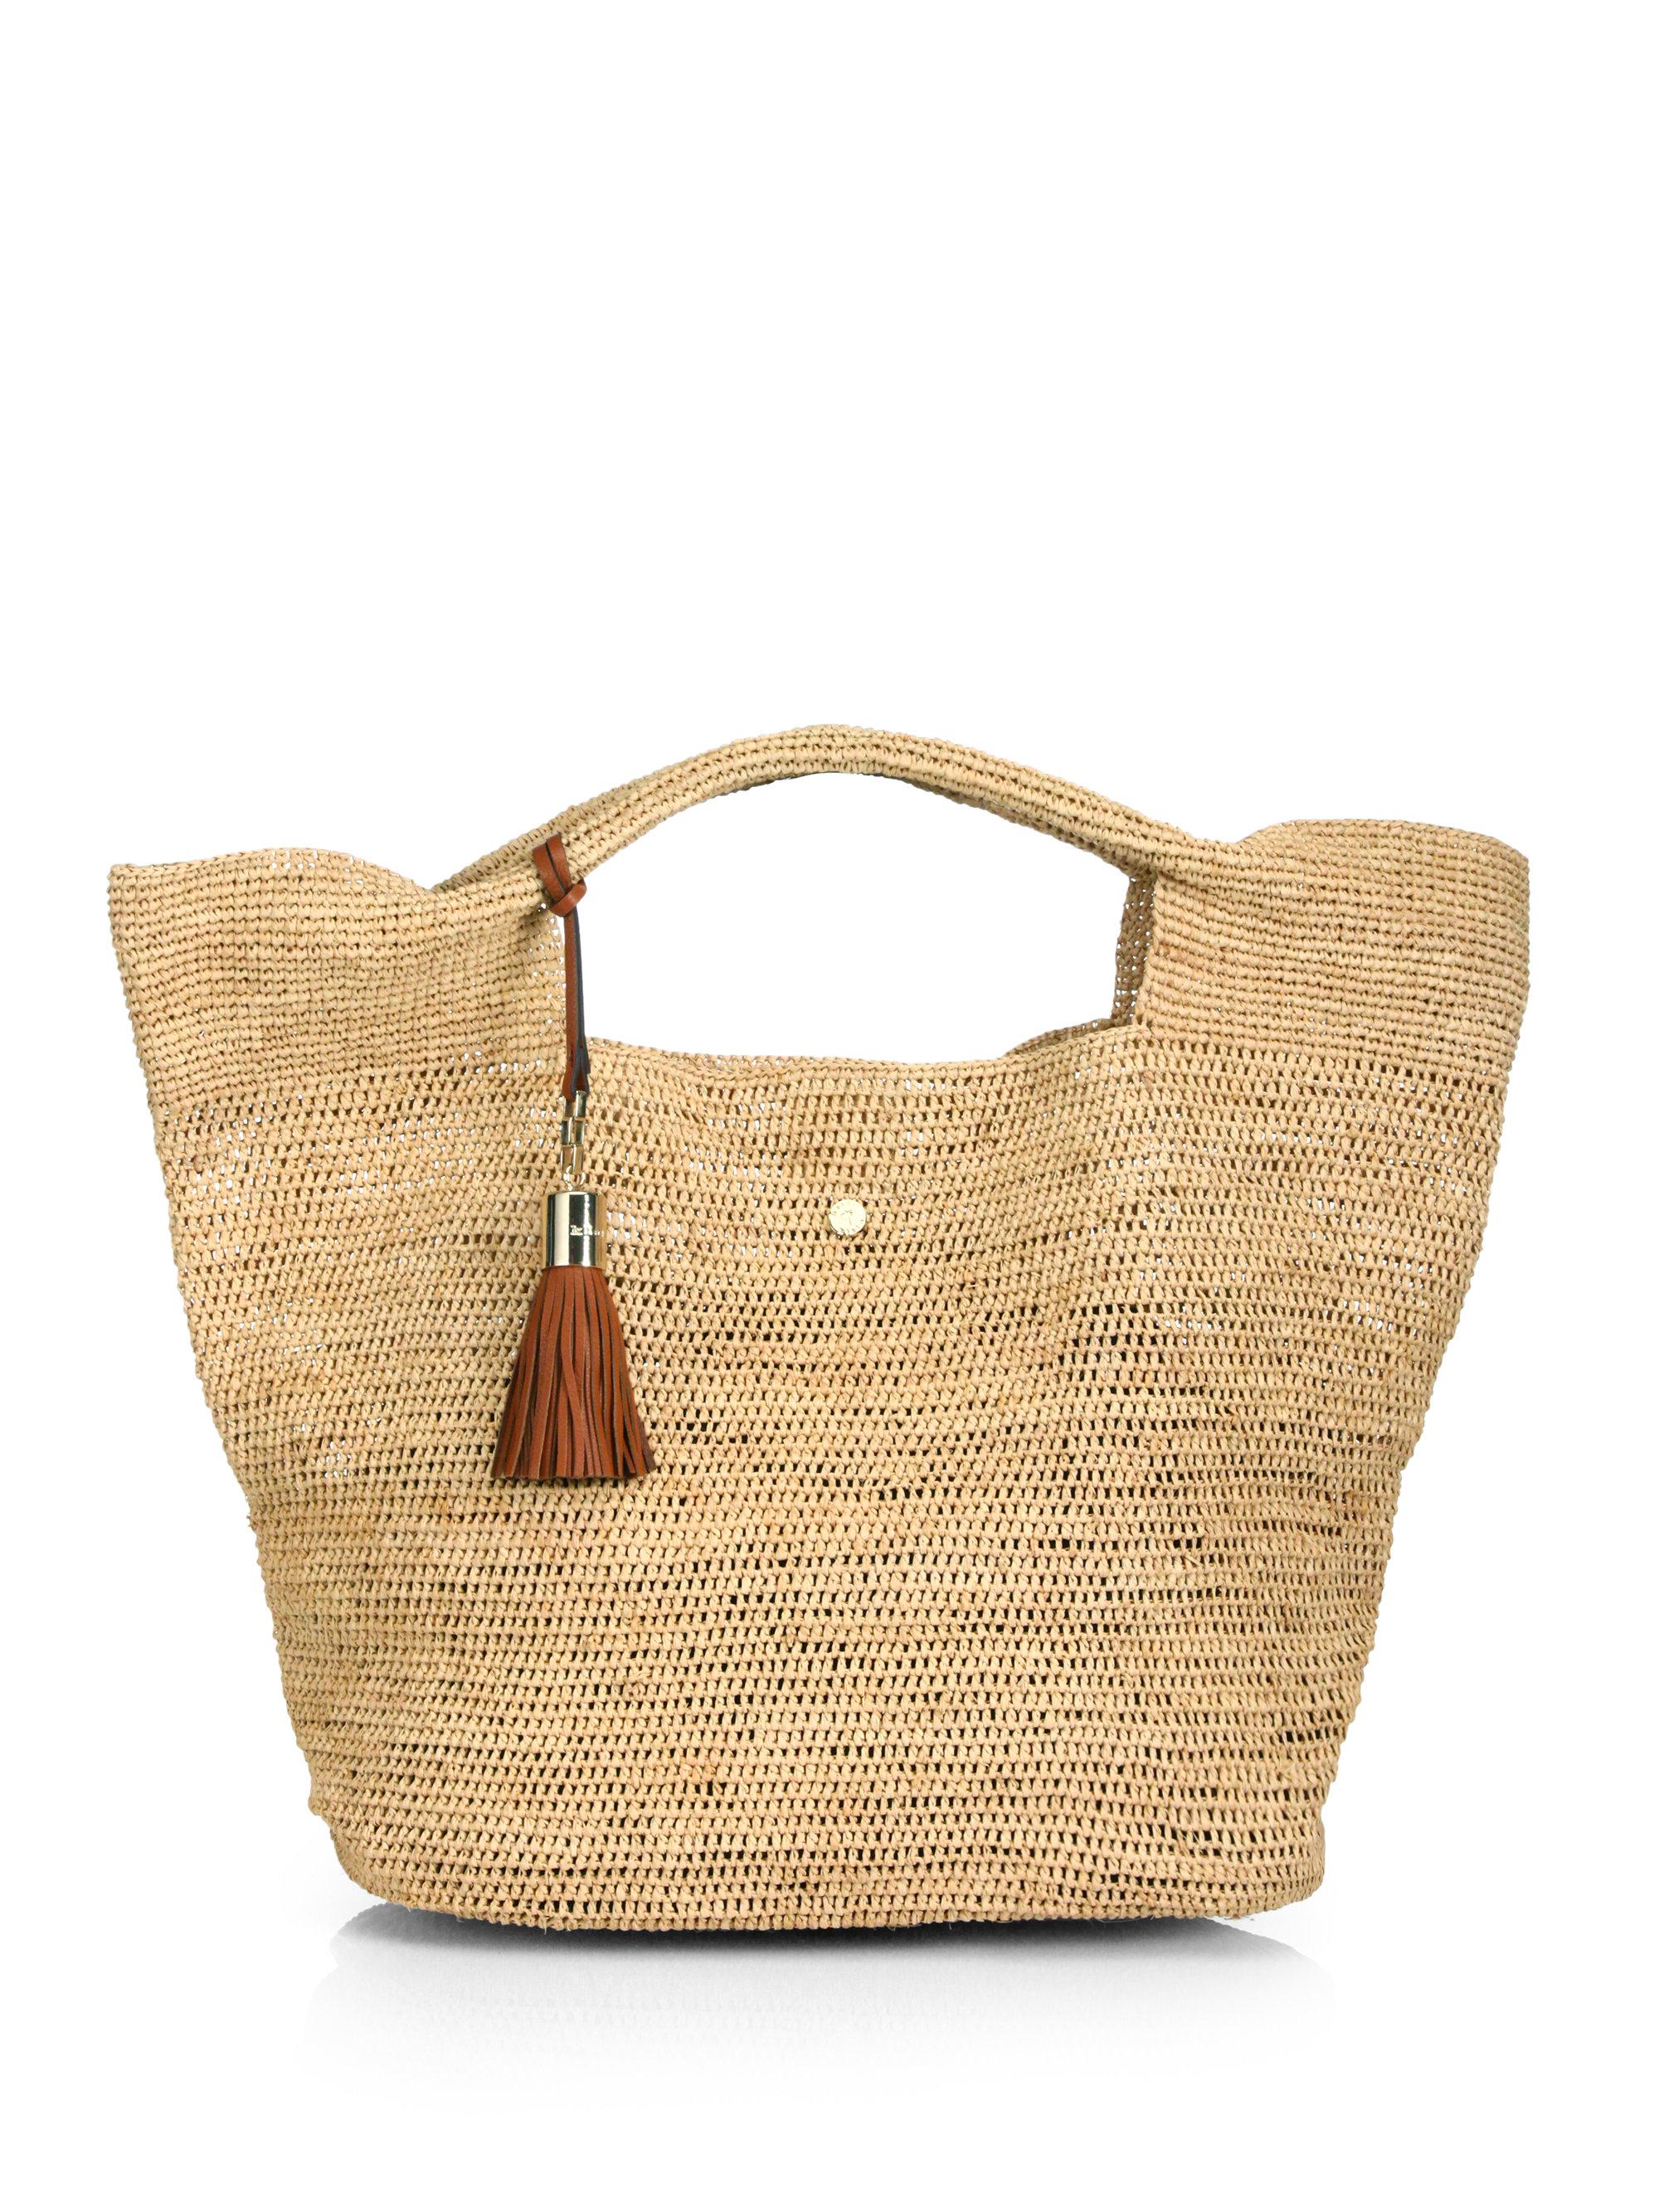 Heidi klein Raffia Beach Bag in Natural | Lyst